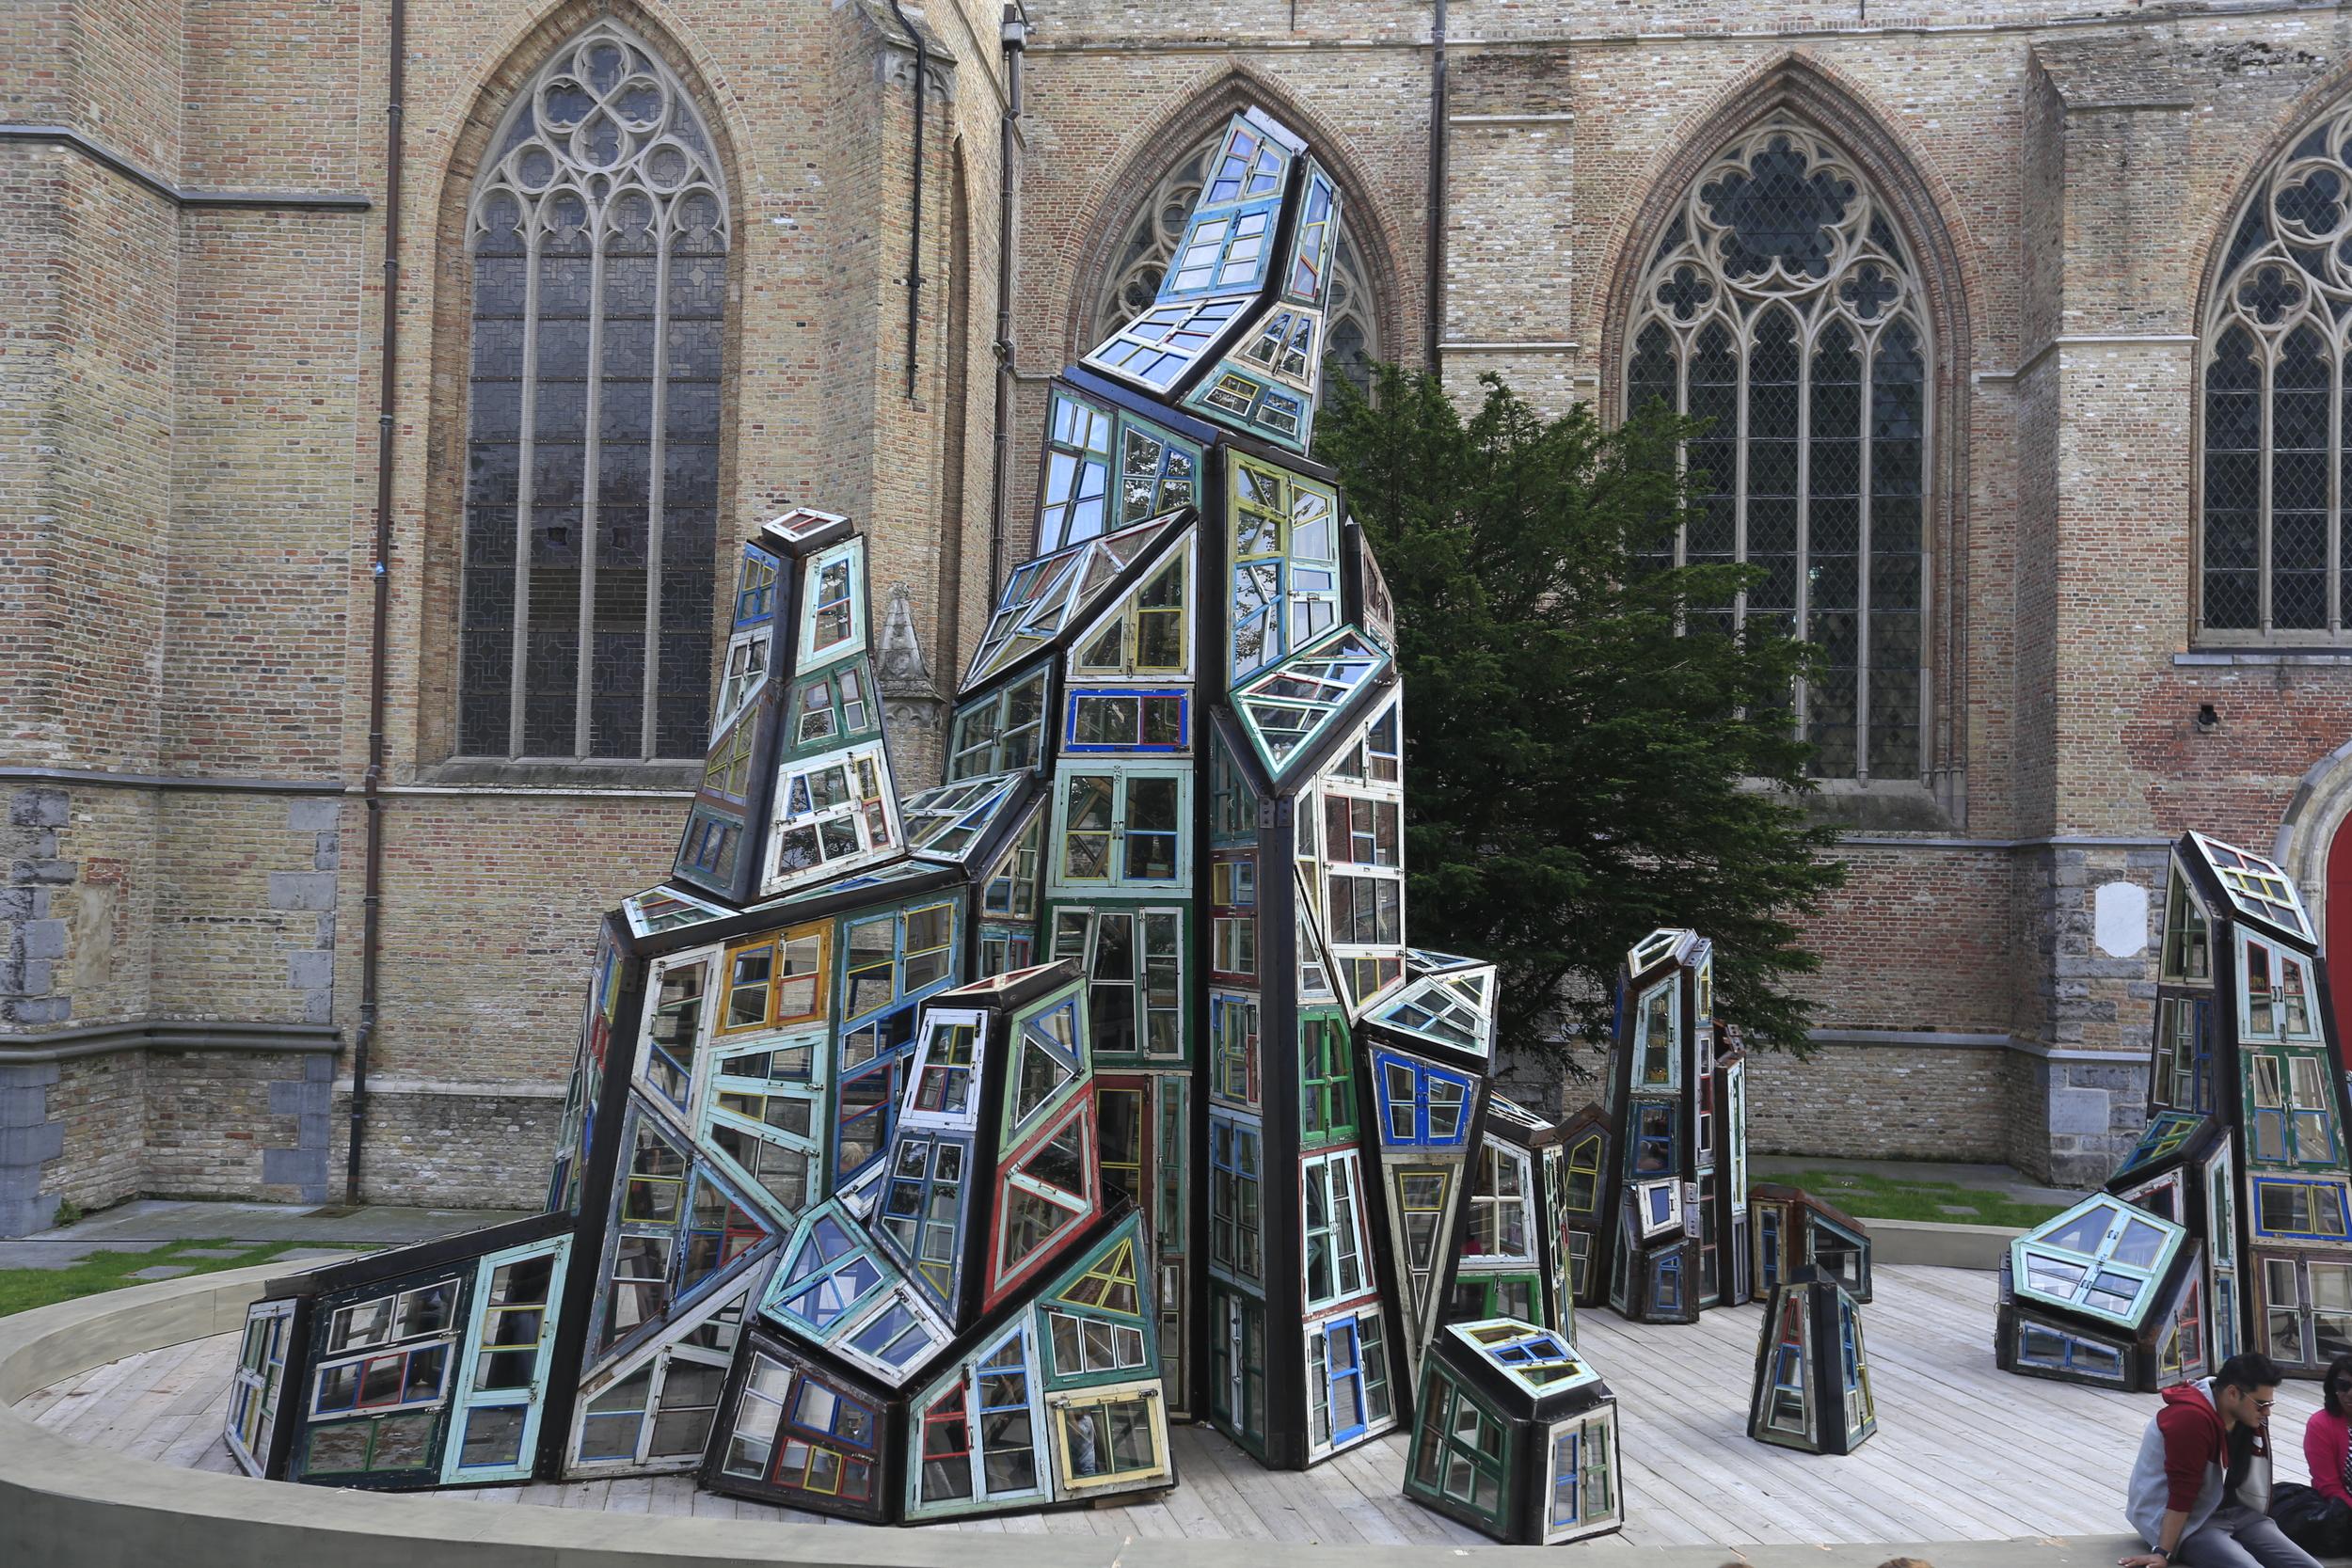 art, modern art, art in bruges, bruges, belgium, street photography, photo, photography blog, bicycle touring apocalypse